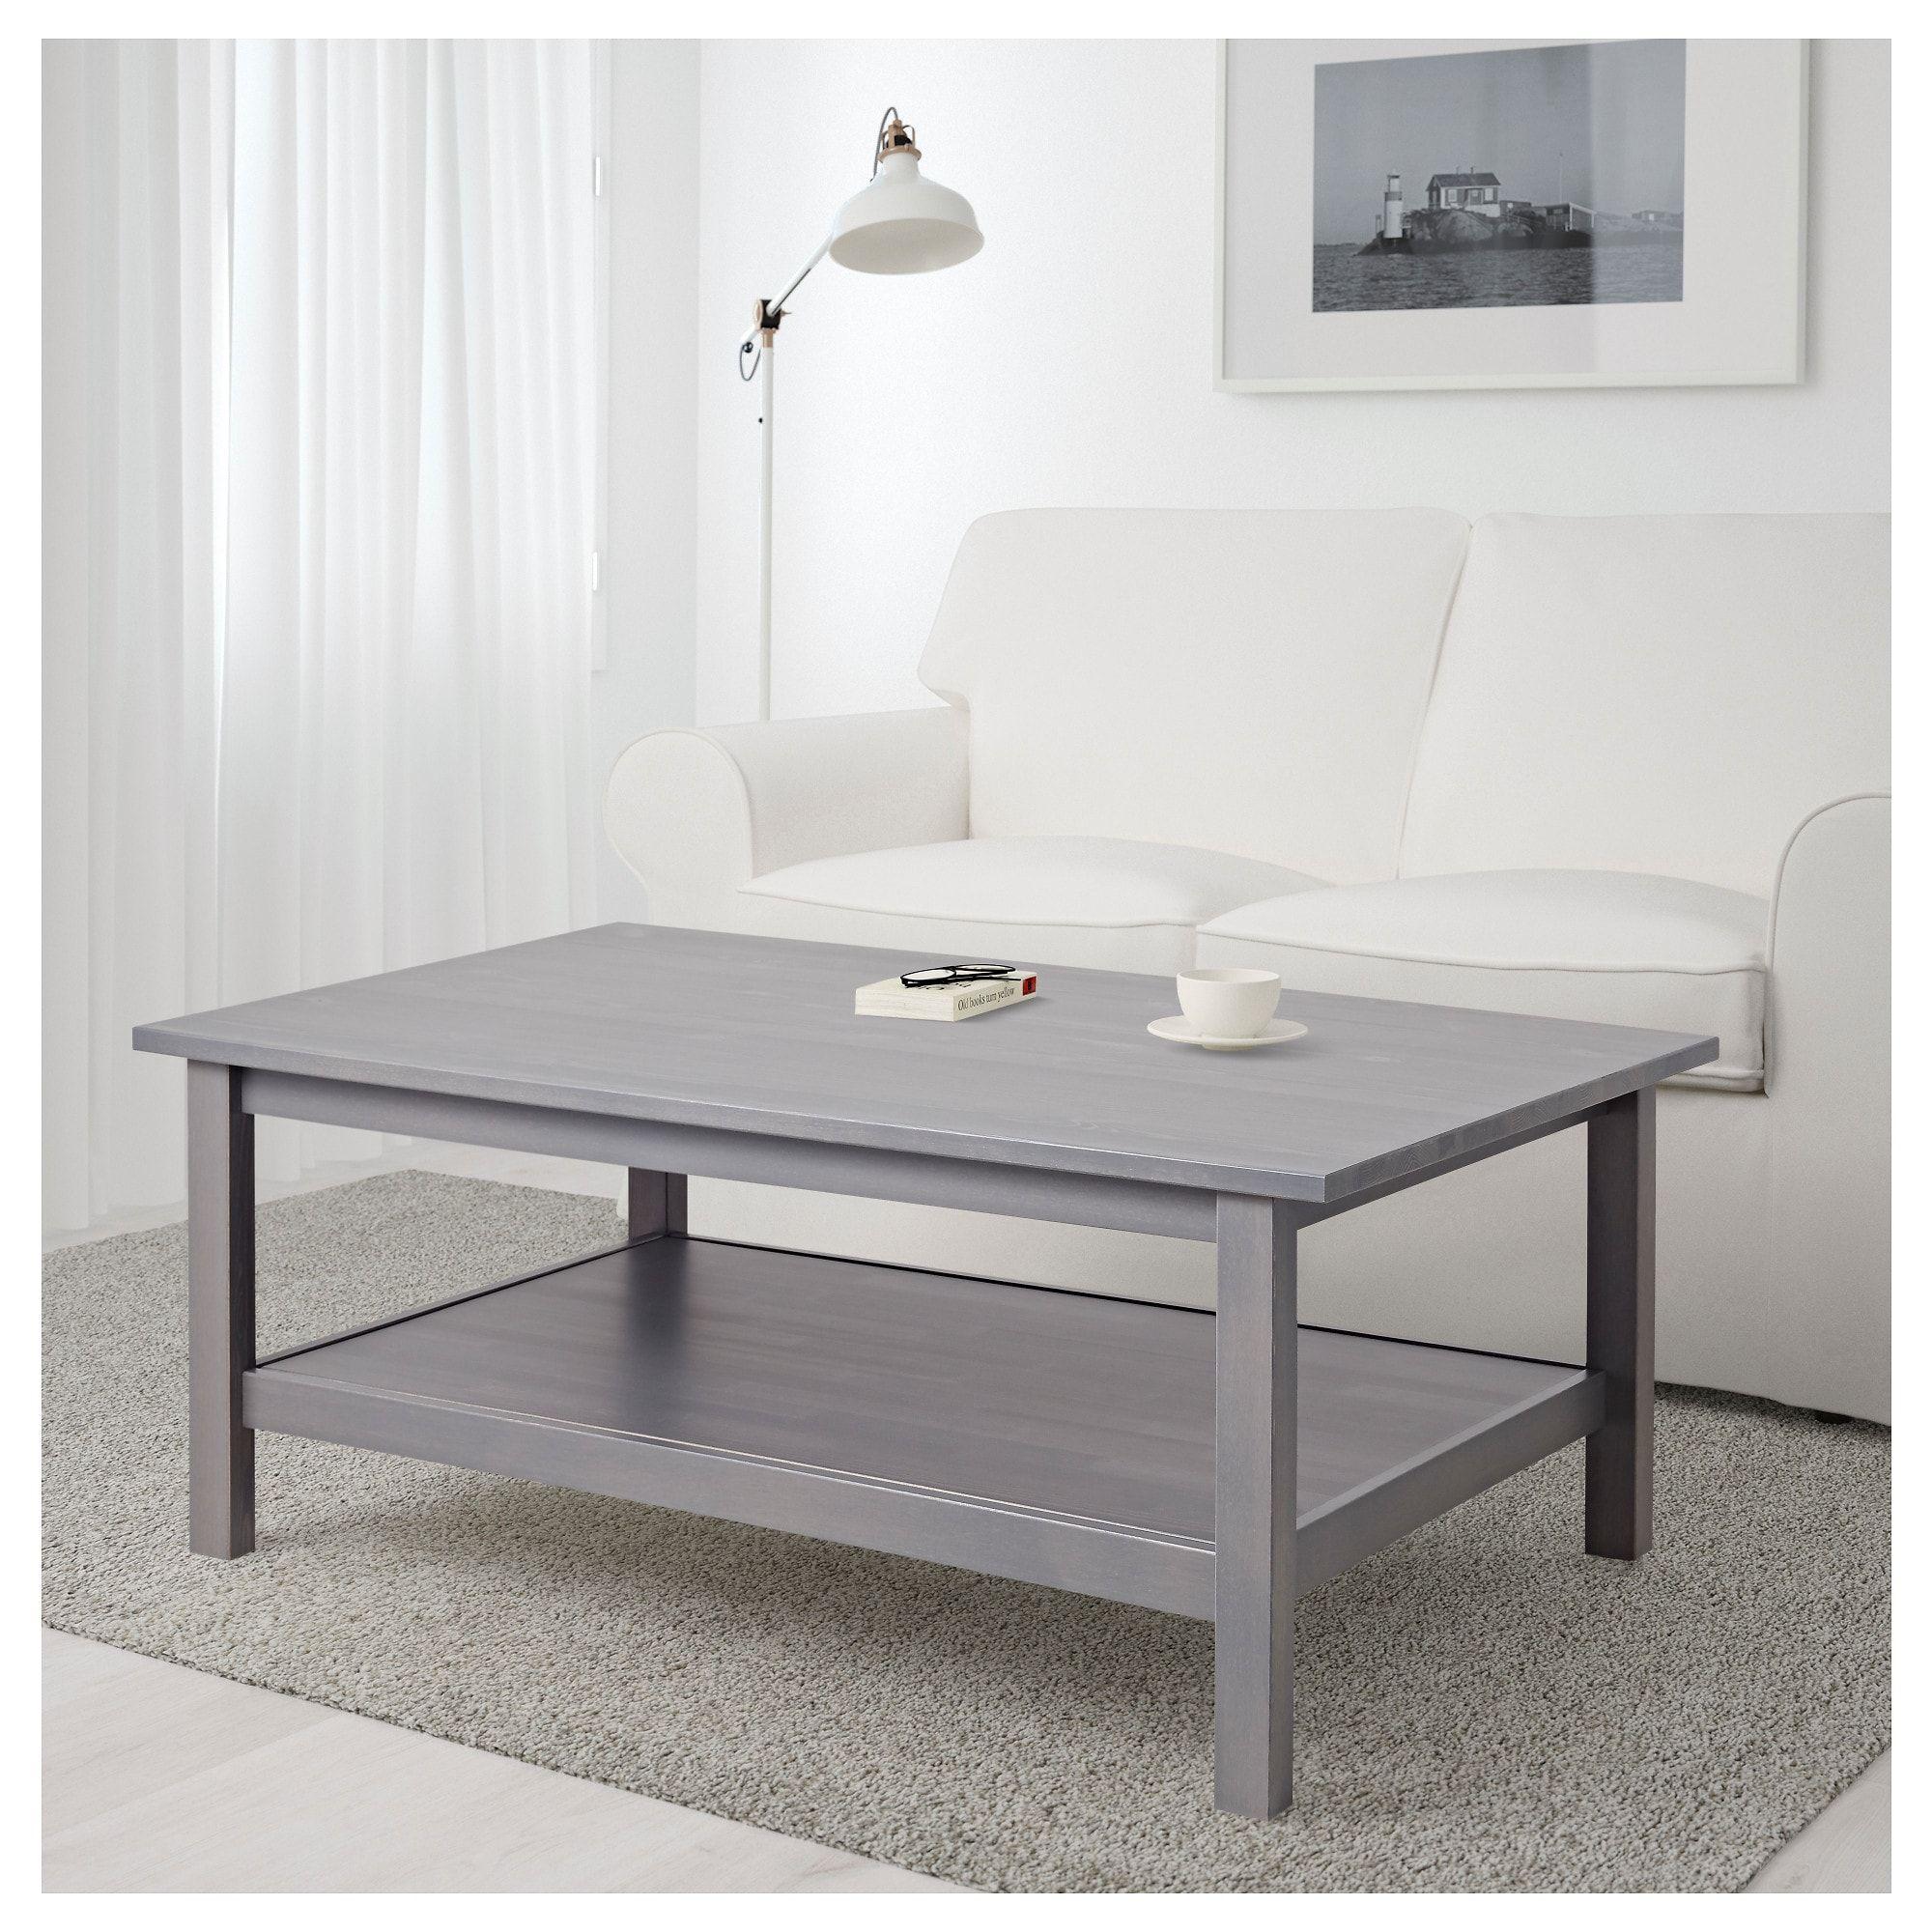 Ikea Hemnes Dark Gray Gray Stained Coffee Table Coffee Table Grey Coffee Table High Gloss Small Living Rooms